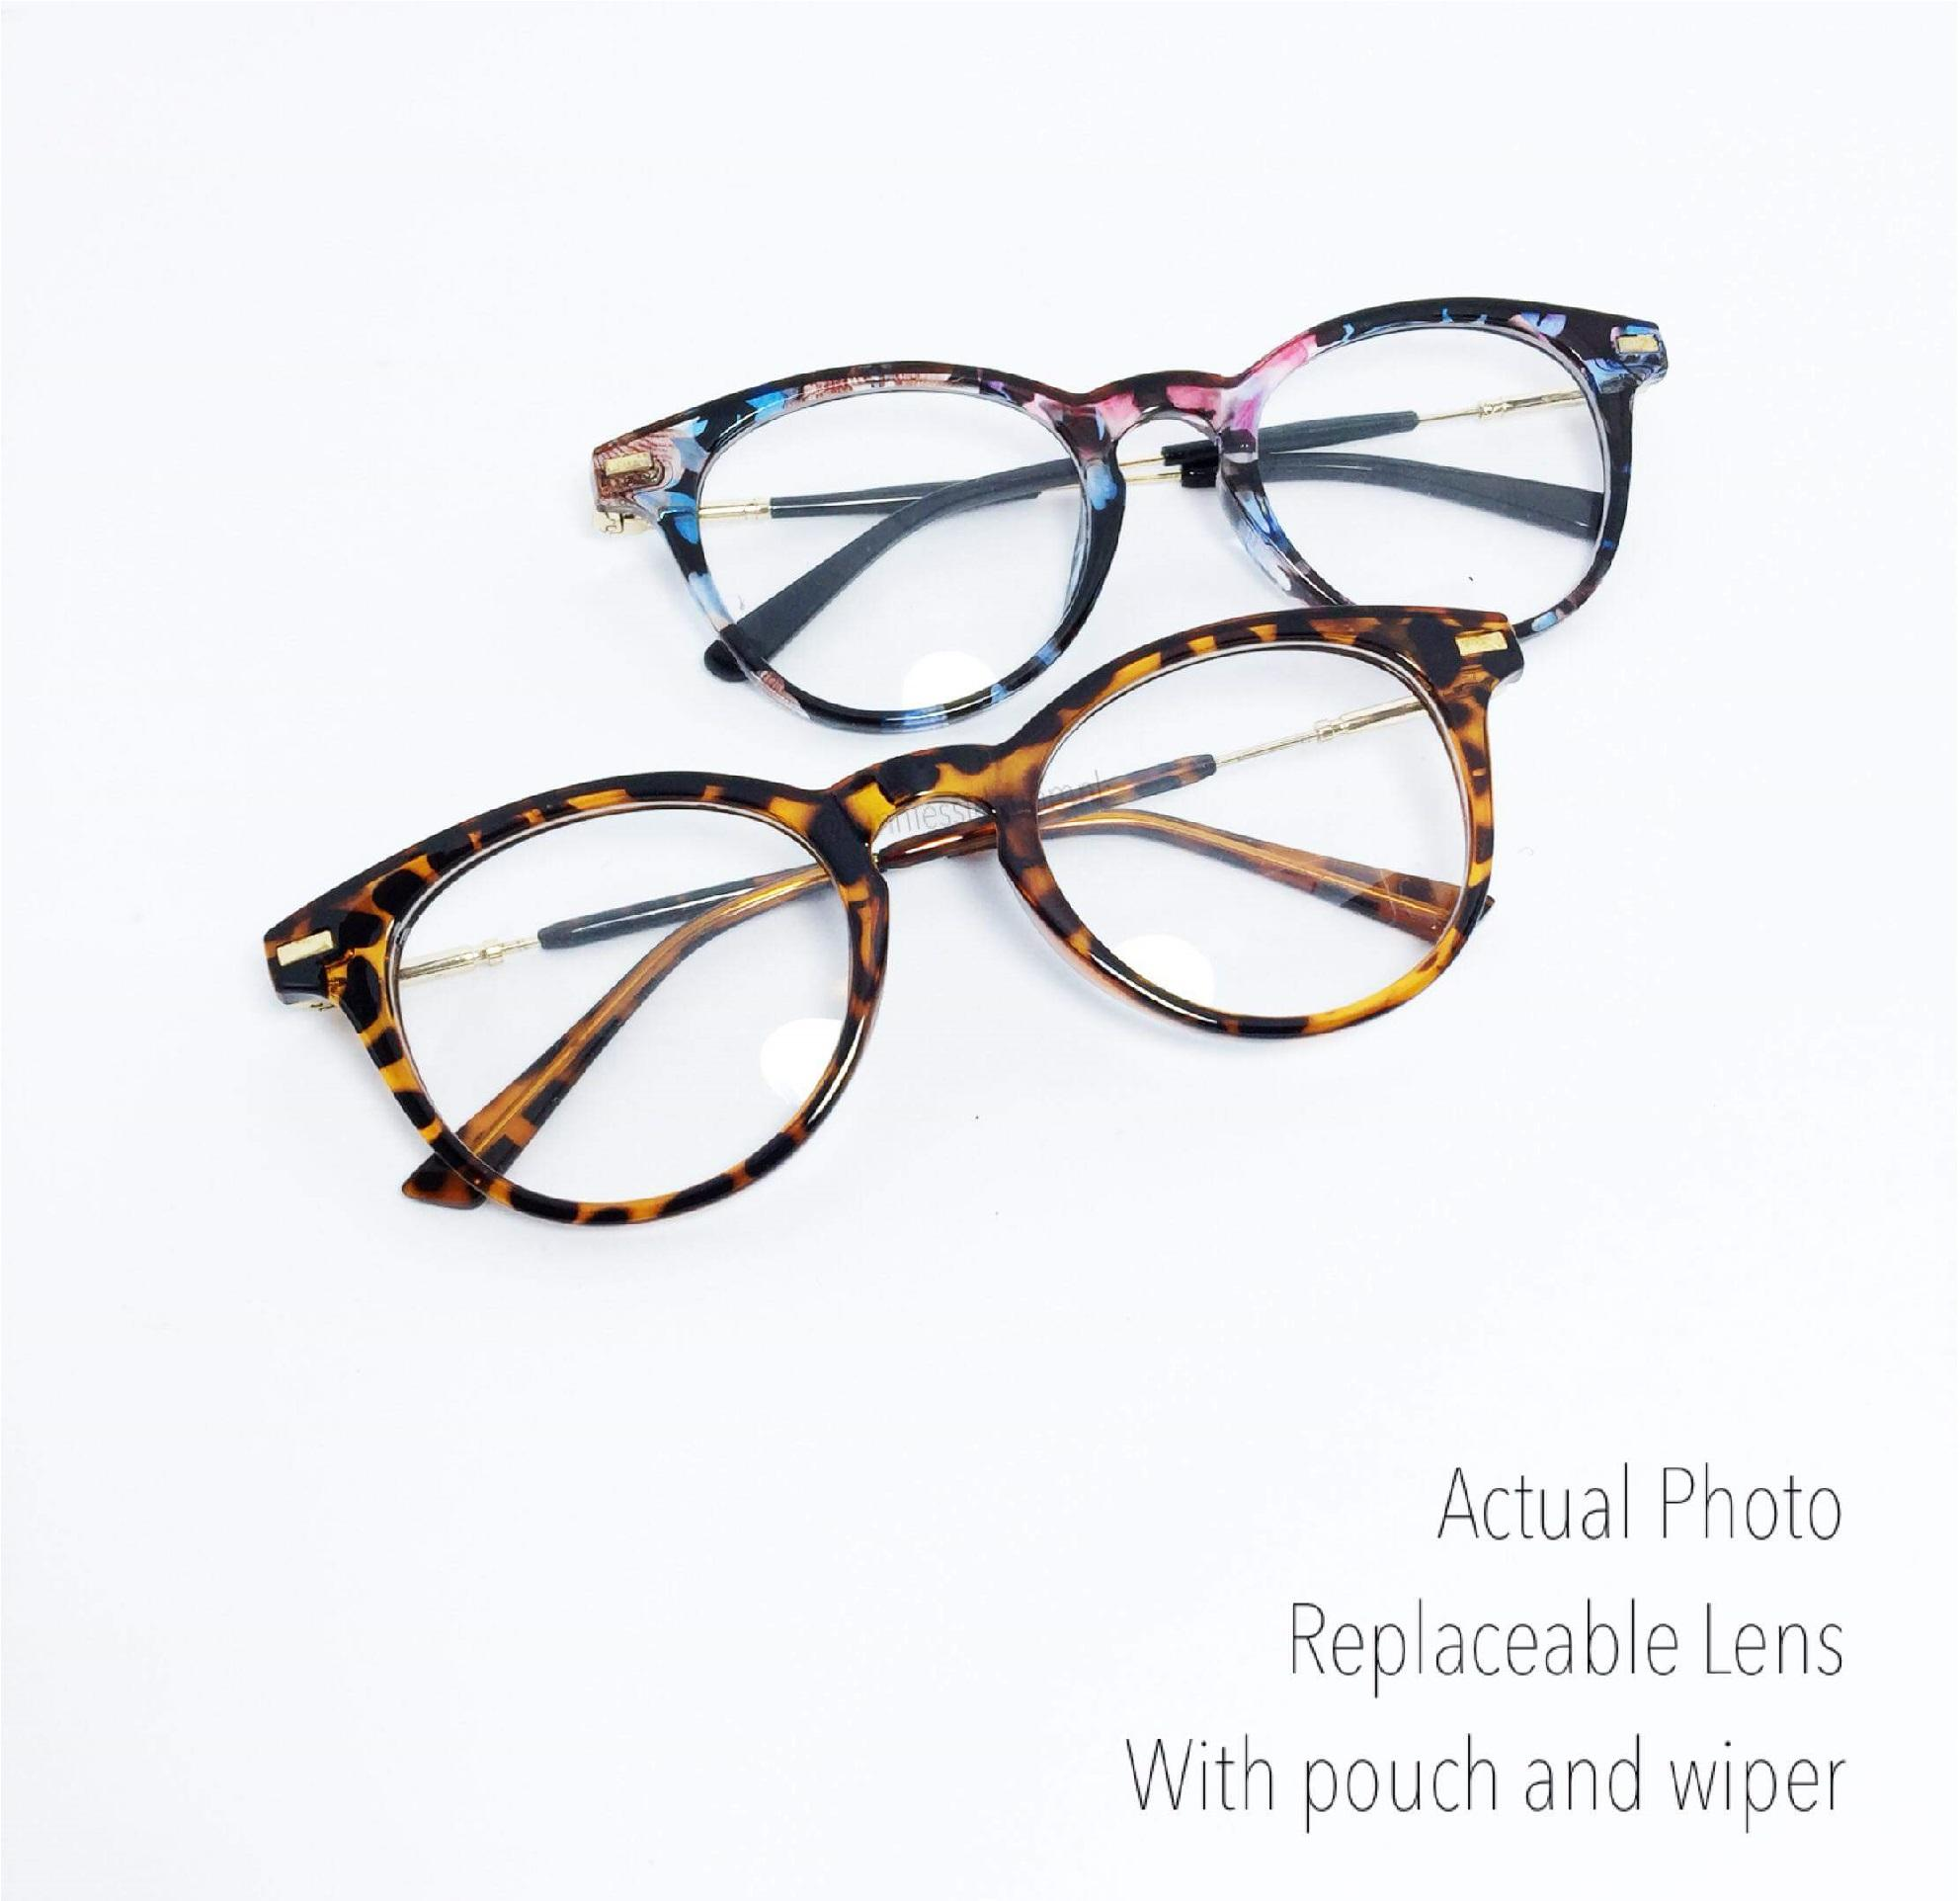 Prescription Glasses for Women for sale - Womens Prescription ... 752f7d5f5d56